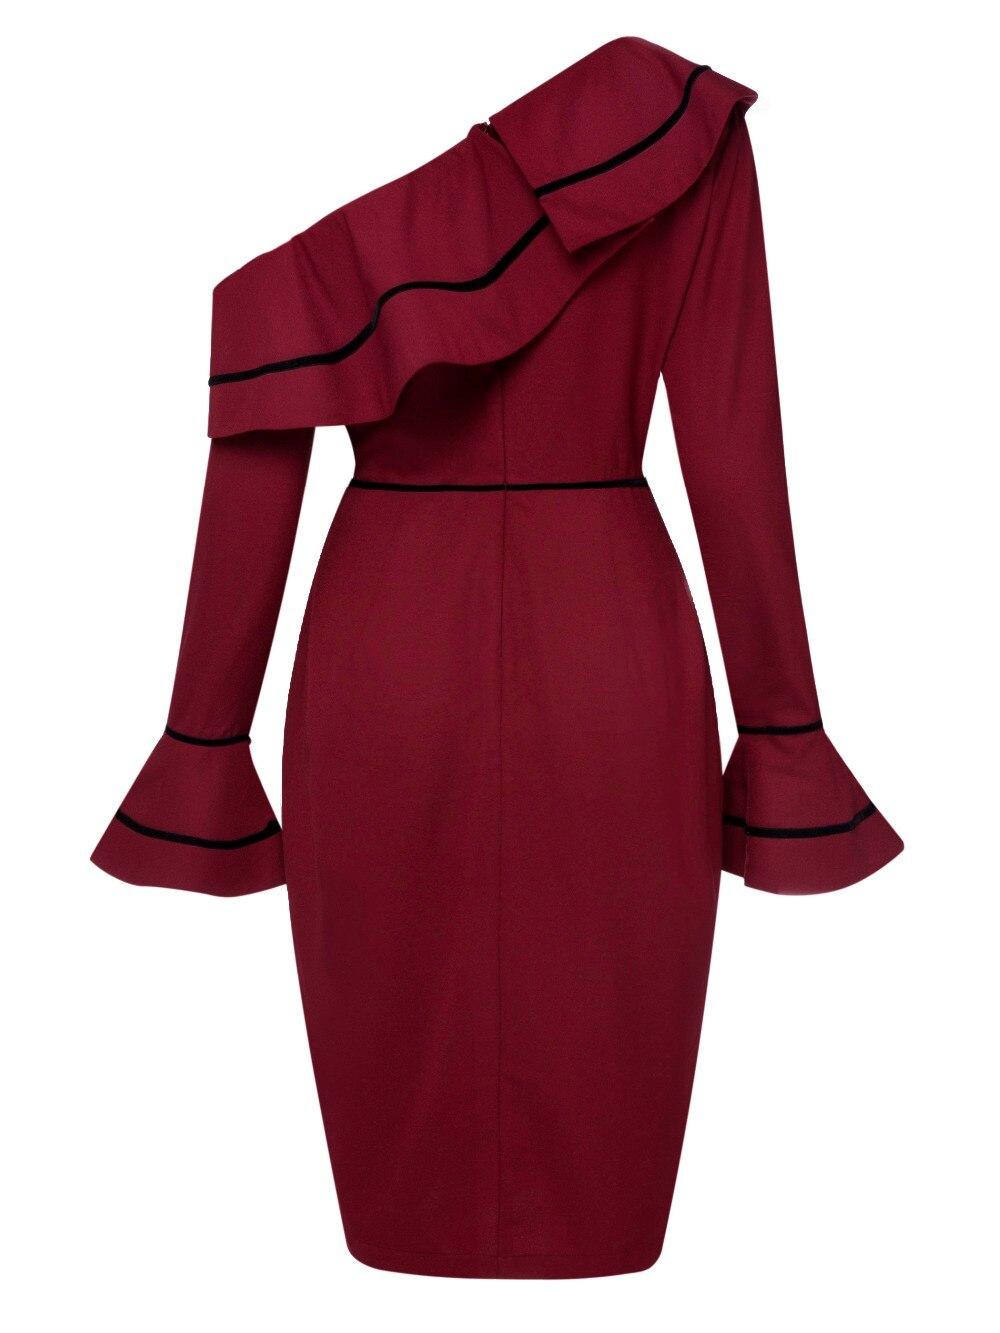 9ff178f881 Wine Red Asymmetric One Shoulder Autumn Pencil Dress Flare Long ...